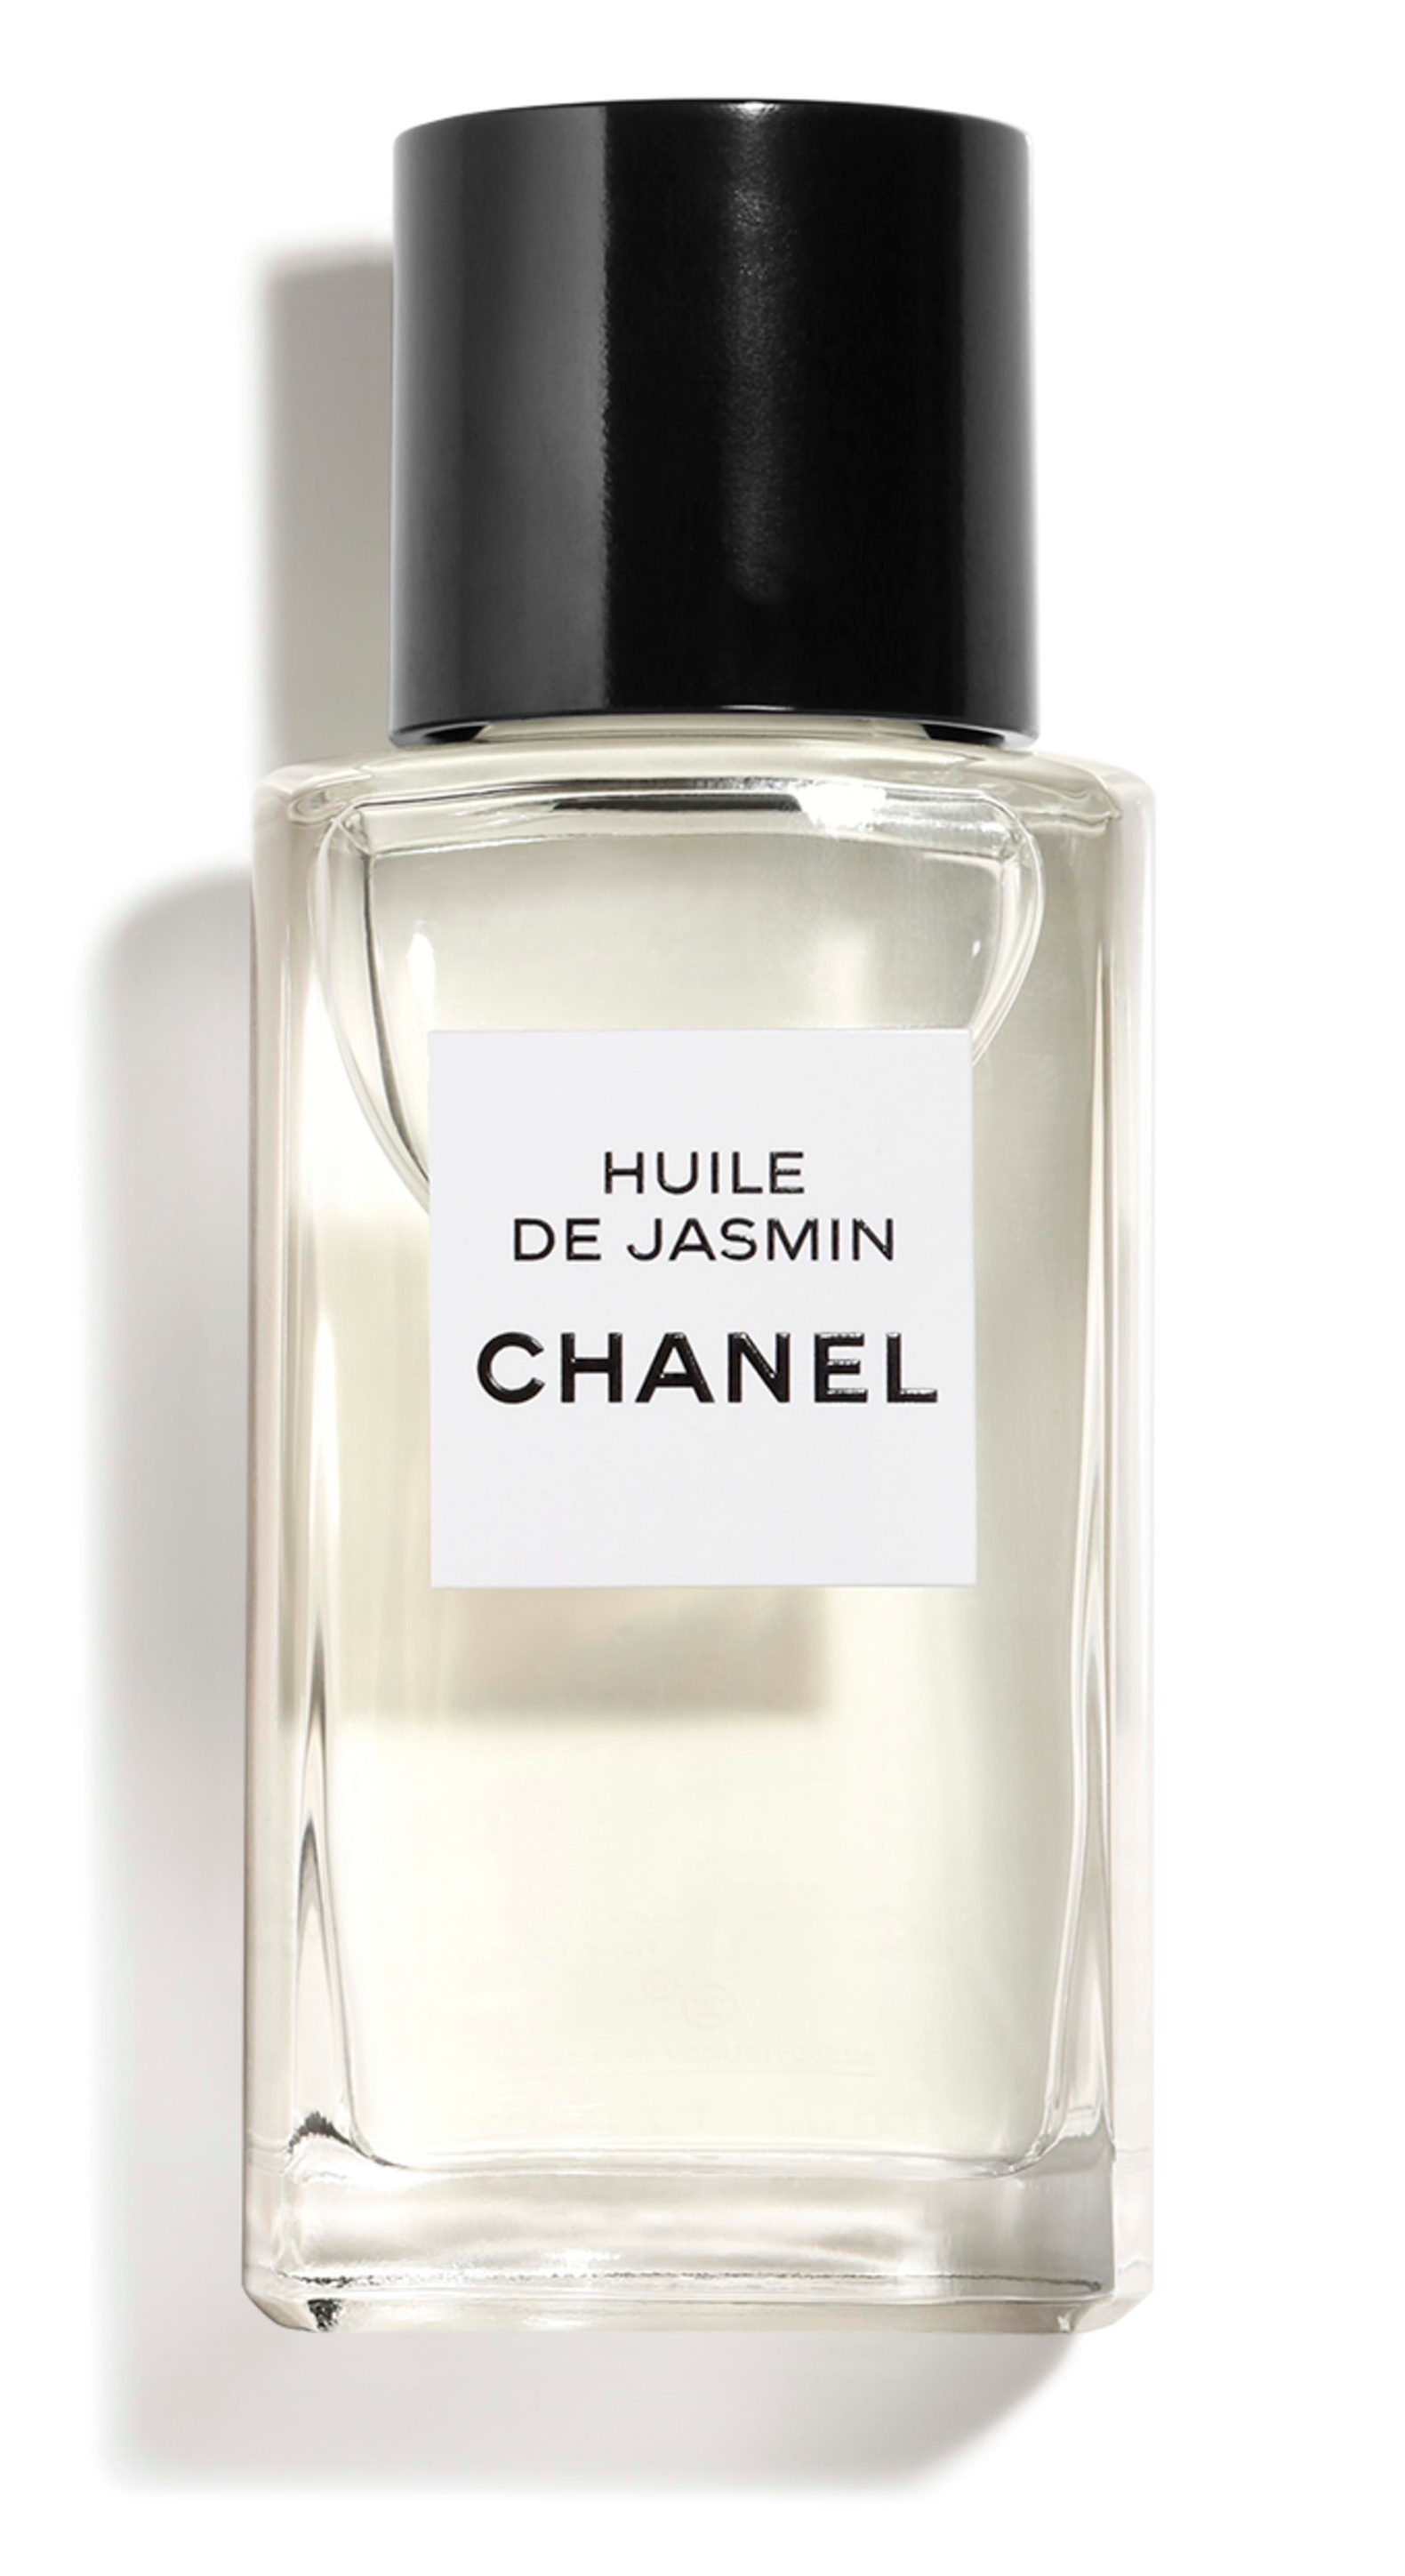 Chanel Huile De Jasmine